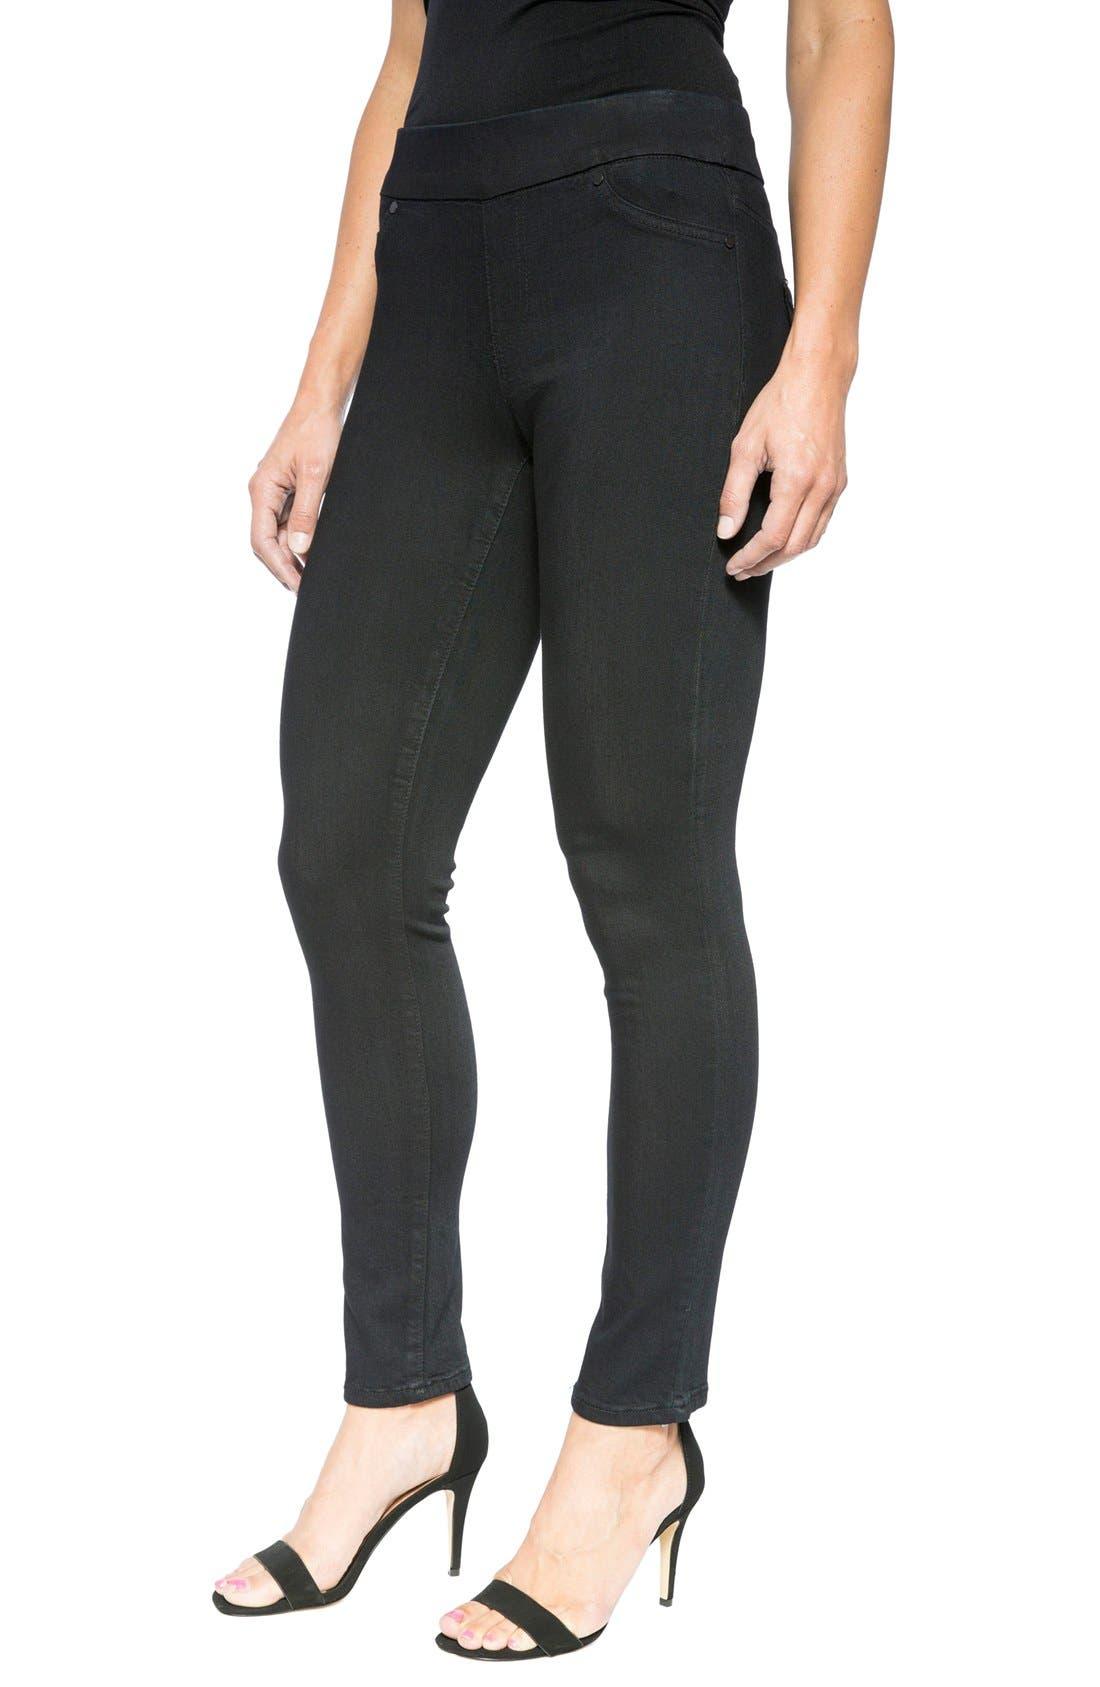 Jeans Company Sienna Mid Rise Soft Stretch Denim Leggings,                             Alternate thumbnail 5, color,                             INDIGO OVERDYE BLACK